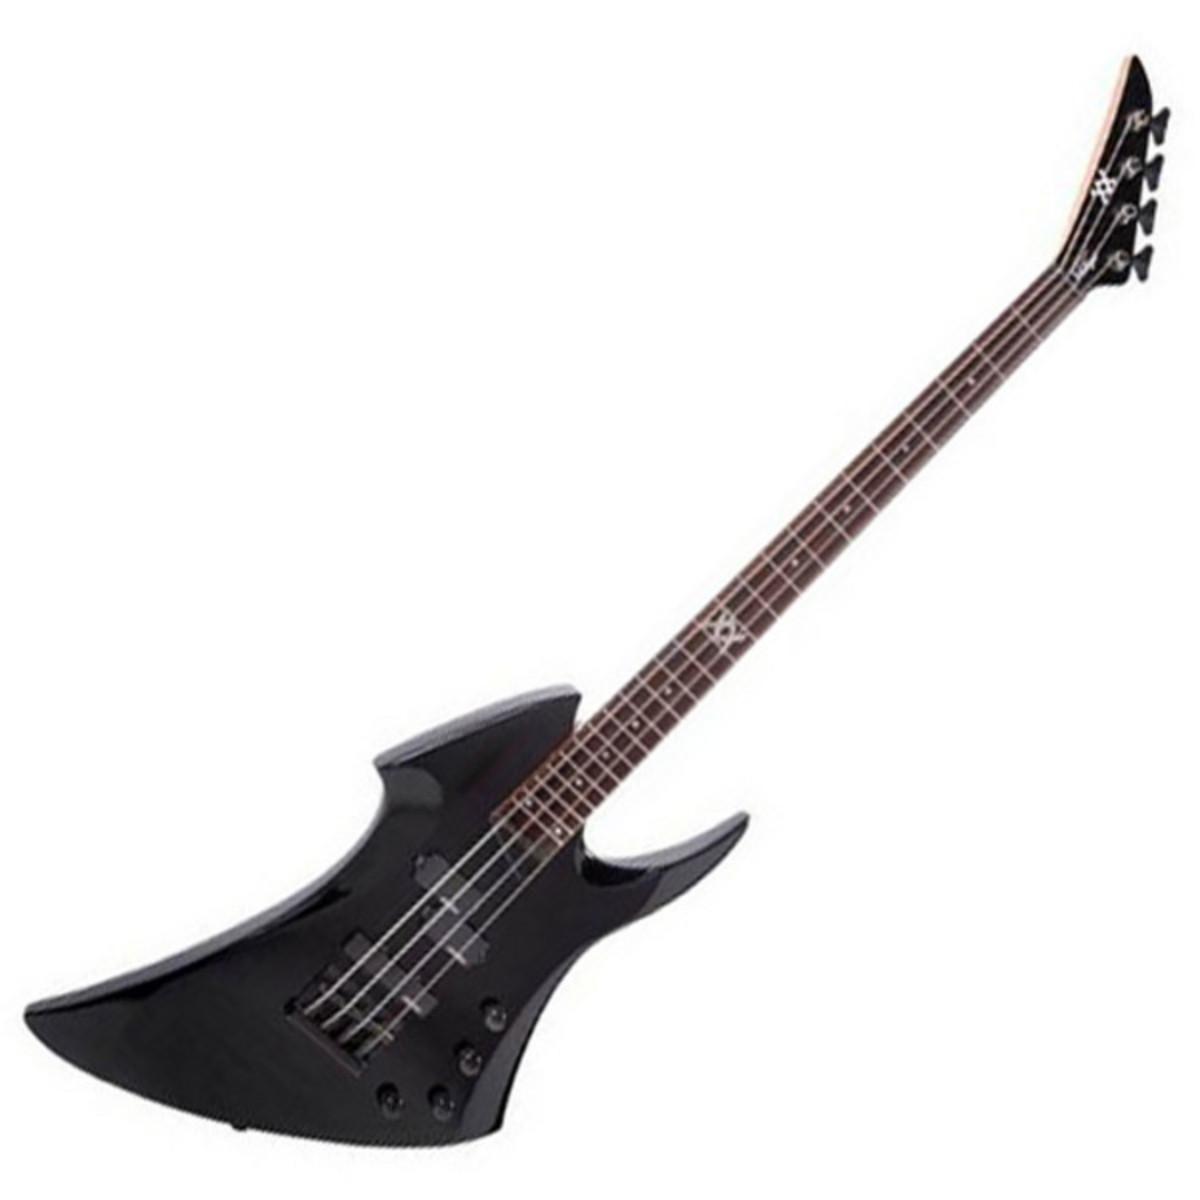 disc vintage metal axxe warp bass guitar gloss black at. Black Bedroom Furniture Sets. Home Design Ideas